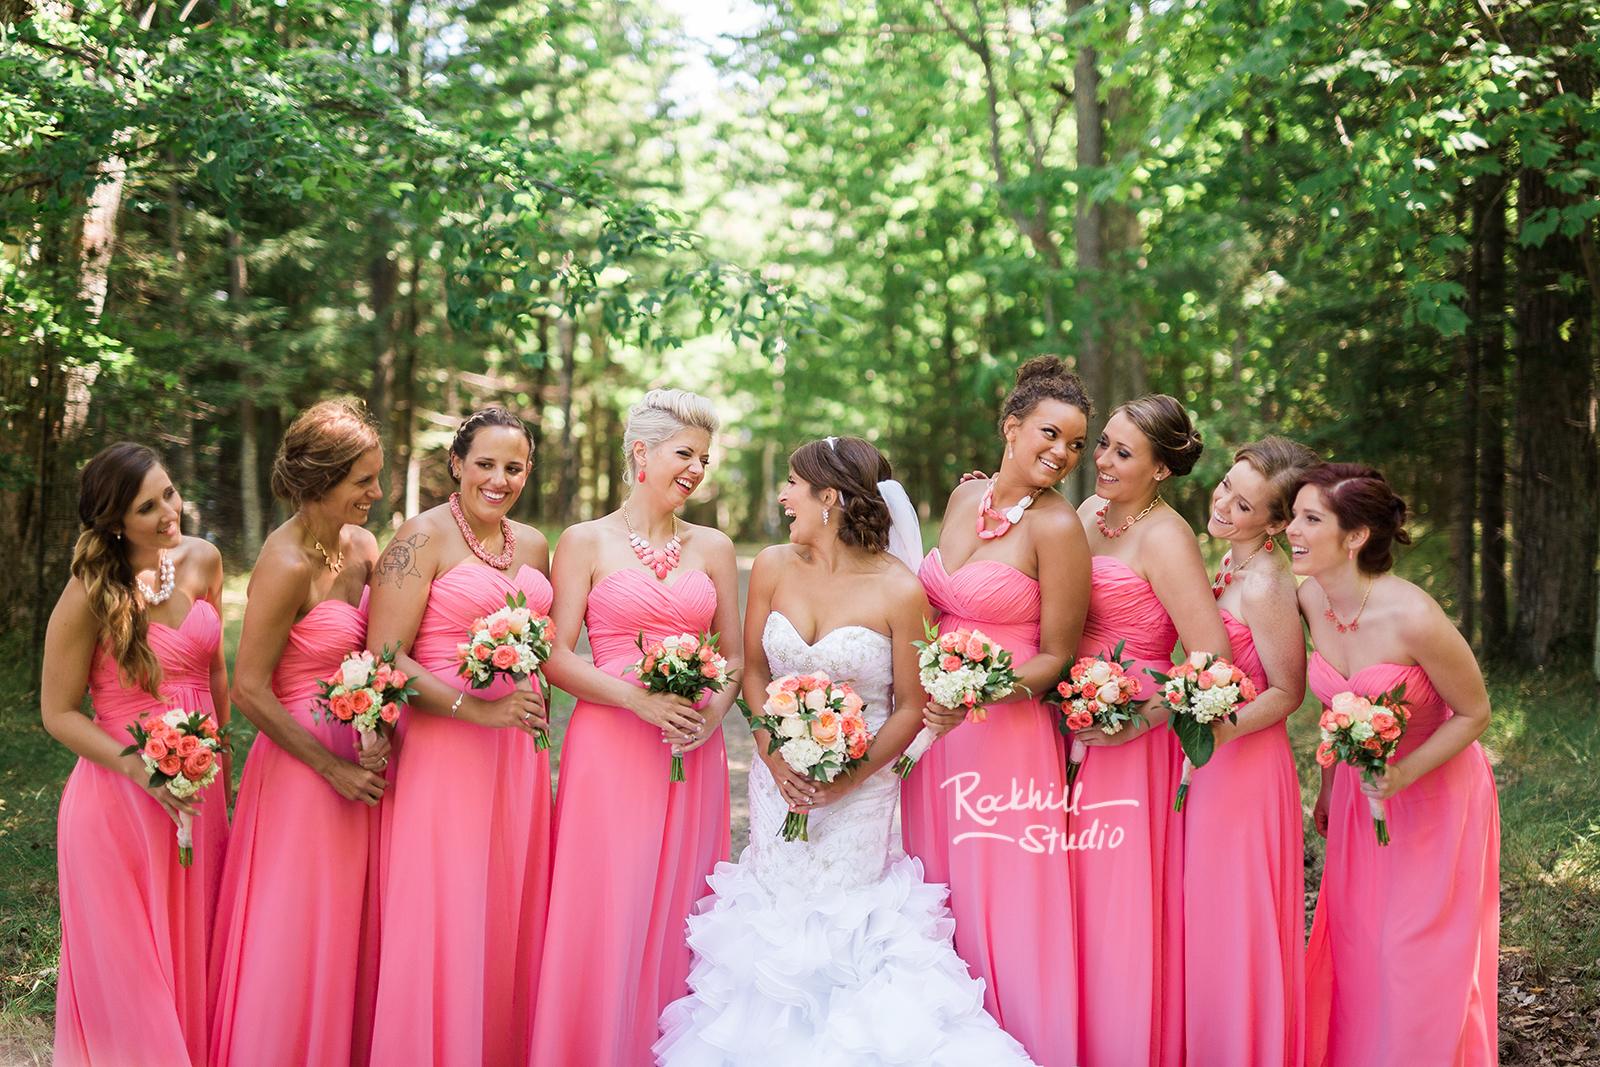 marquette-wedding-upper-peninsula-northern-michigan-wedding-ck-photography-wedding-party-21.jpg